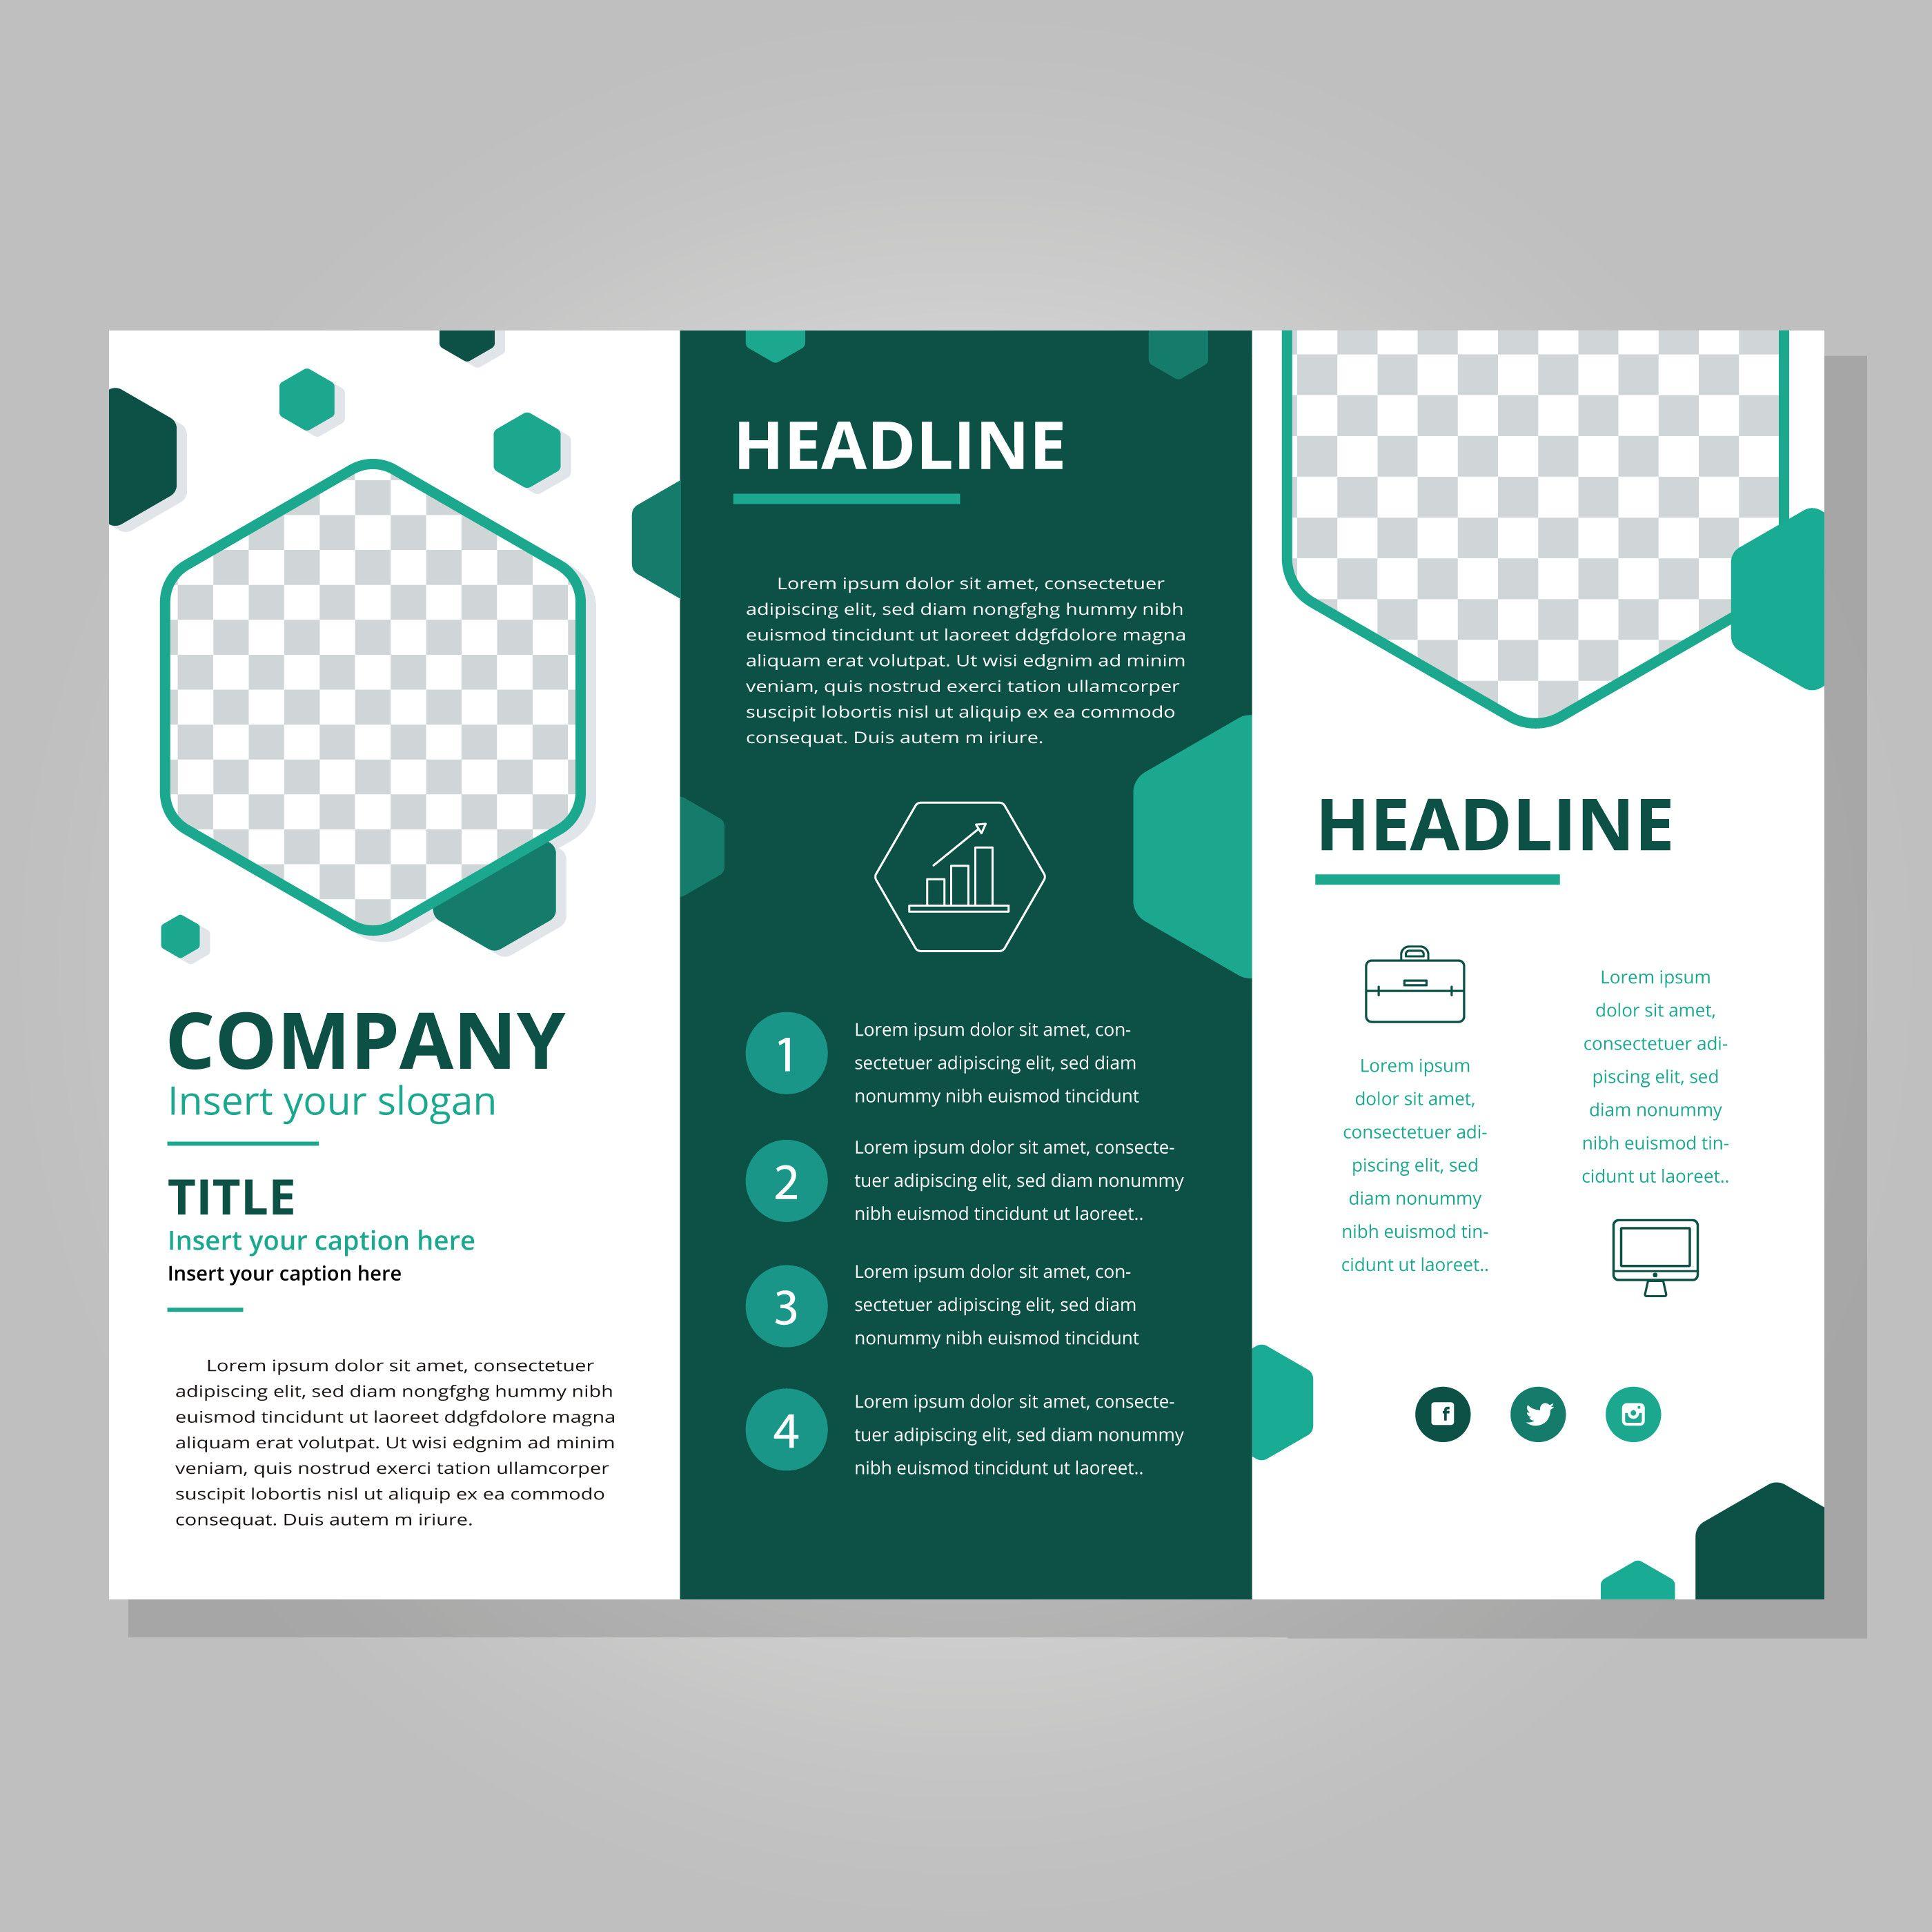 3 Fold Brochures Templates Fresh Modern Tri Fold Brochure Template Download Free Vect Free Brochure Template Brochure Design Template Trifold Brochure Template